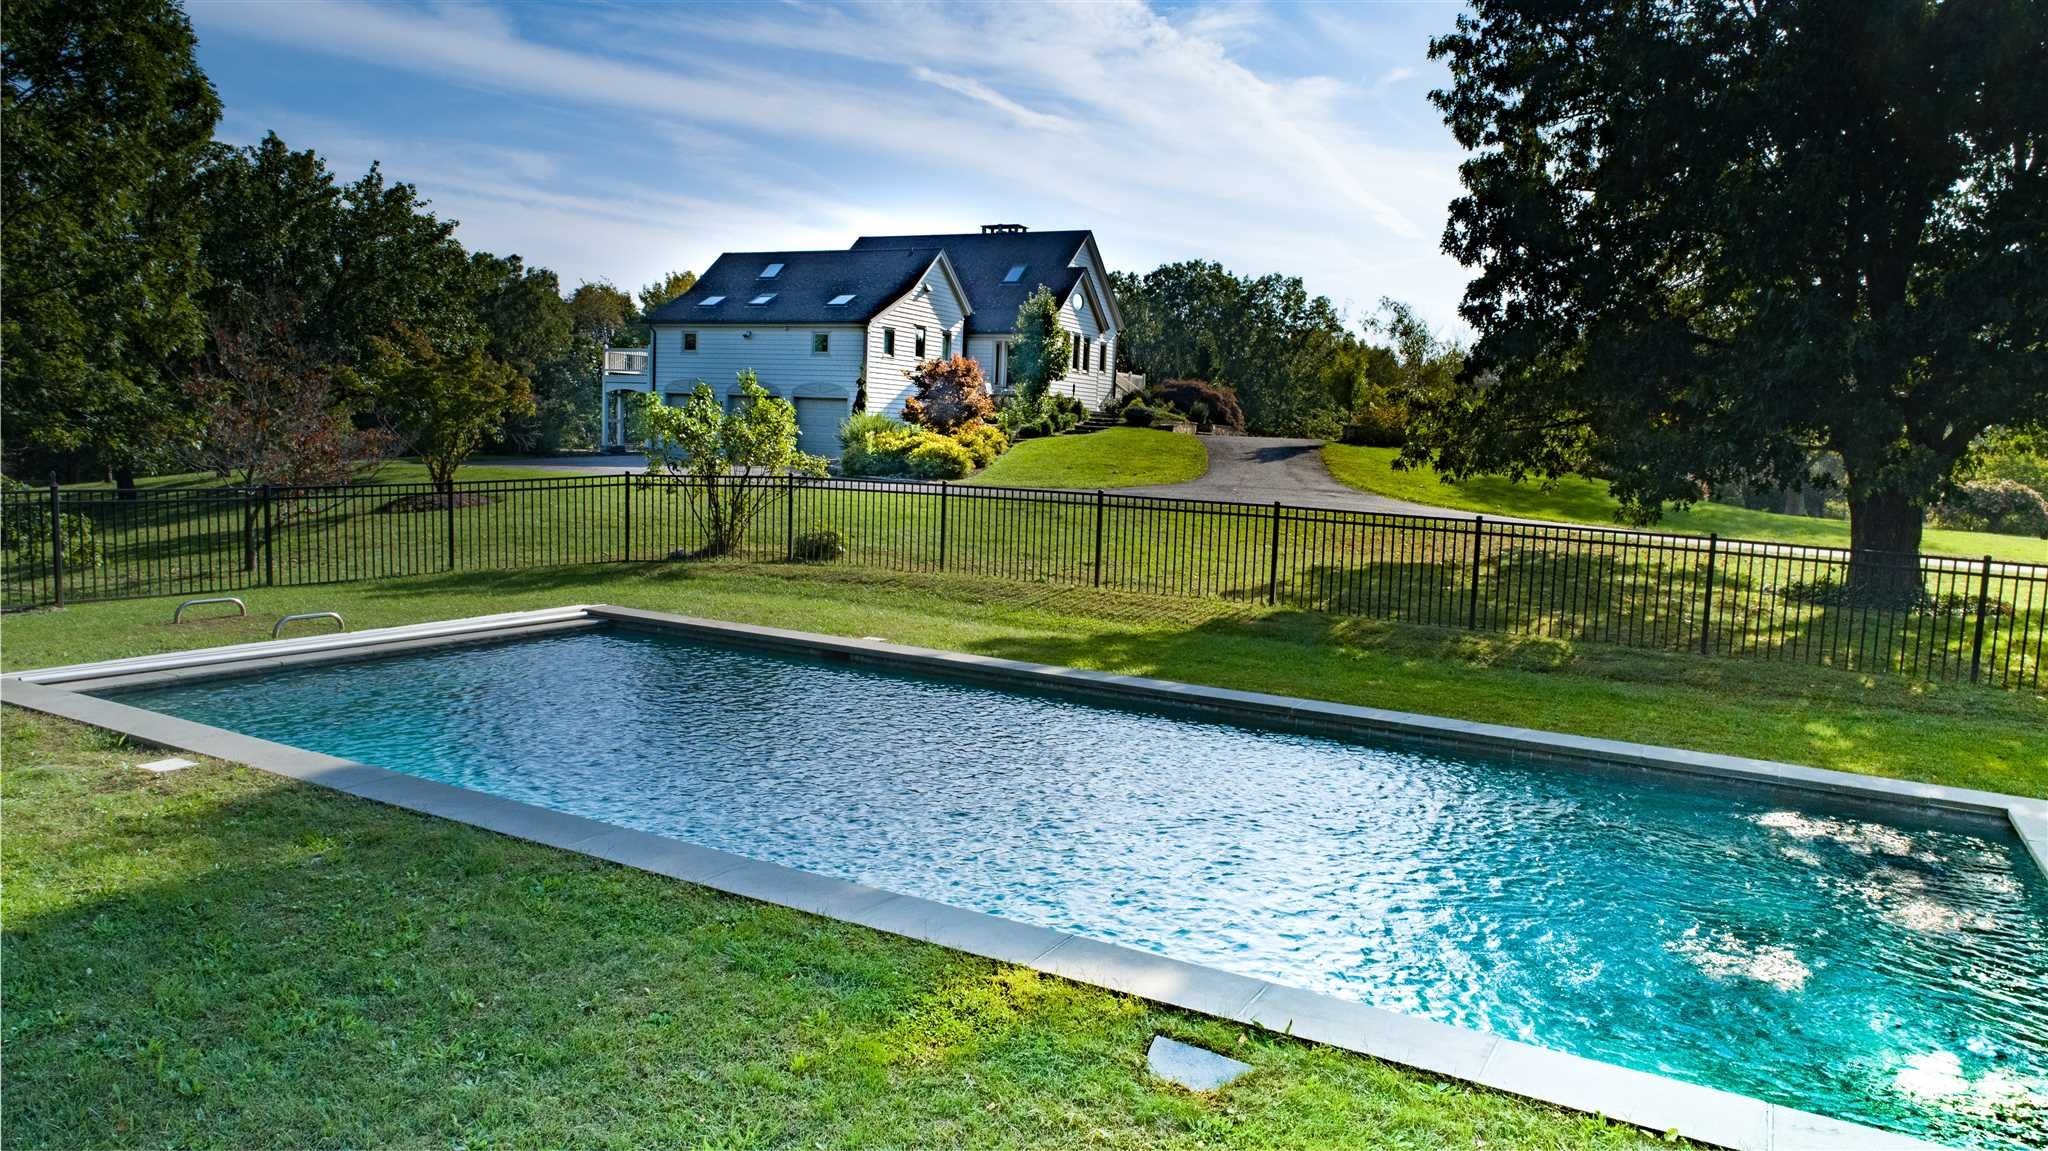 Single Family Home for Sale at 7 QUAKER RIDGE ROAD 7 QUAKER RIDGE ROAD Sherman, Connecticut 06784 United States